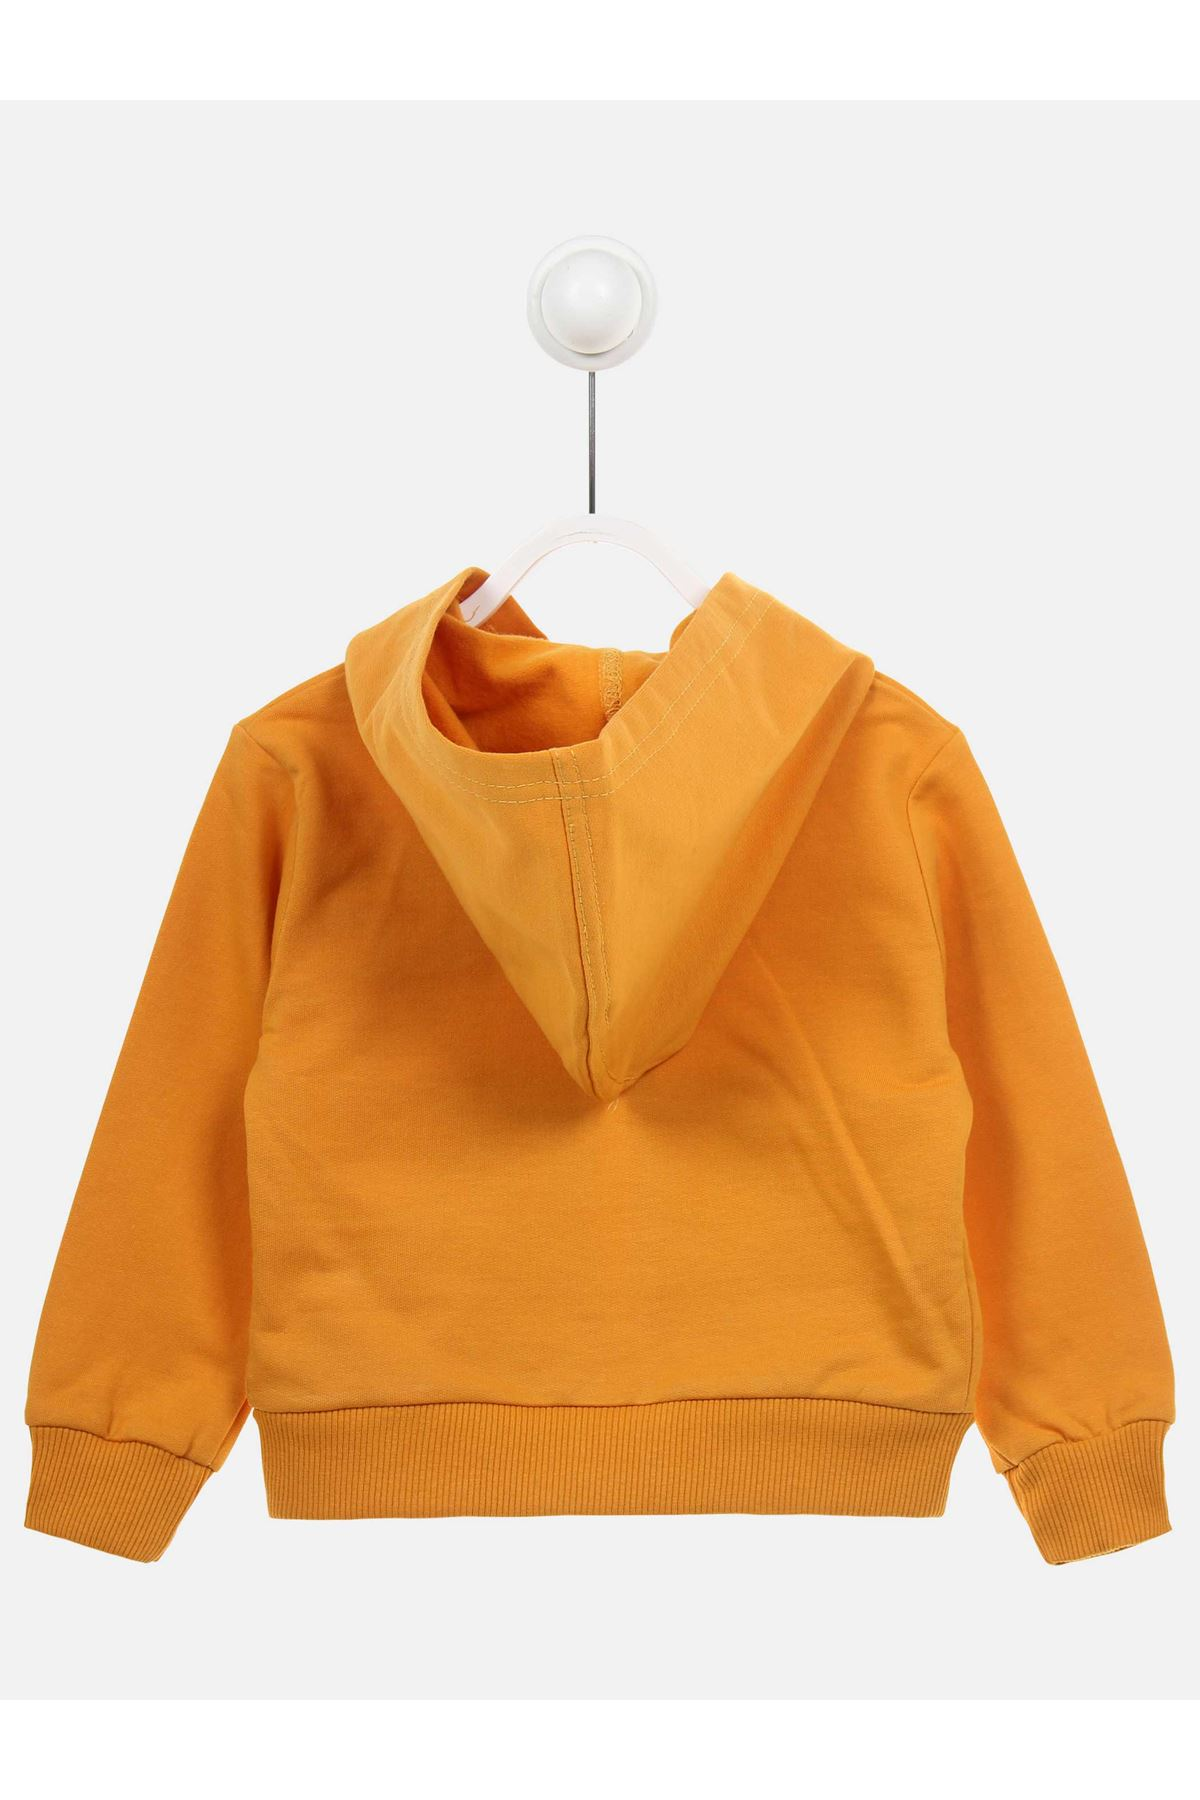 Mustard Seasonal Male Child Sweatshirt